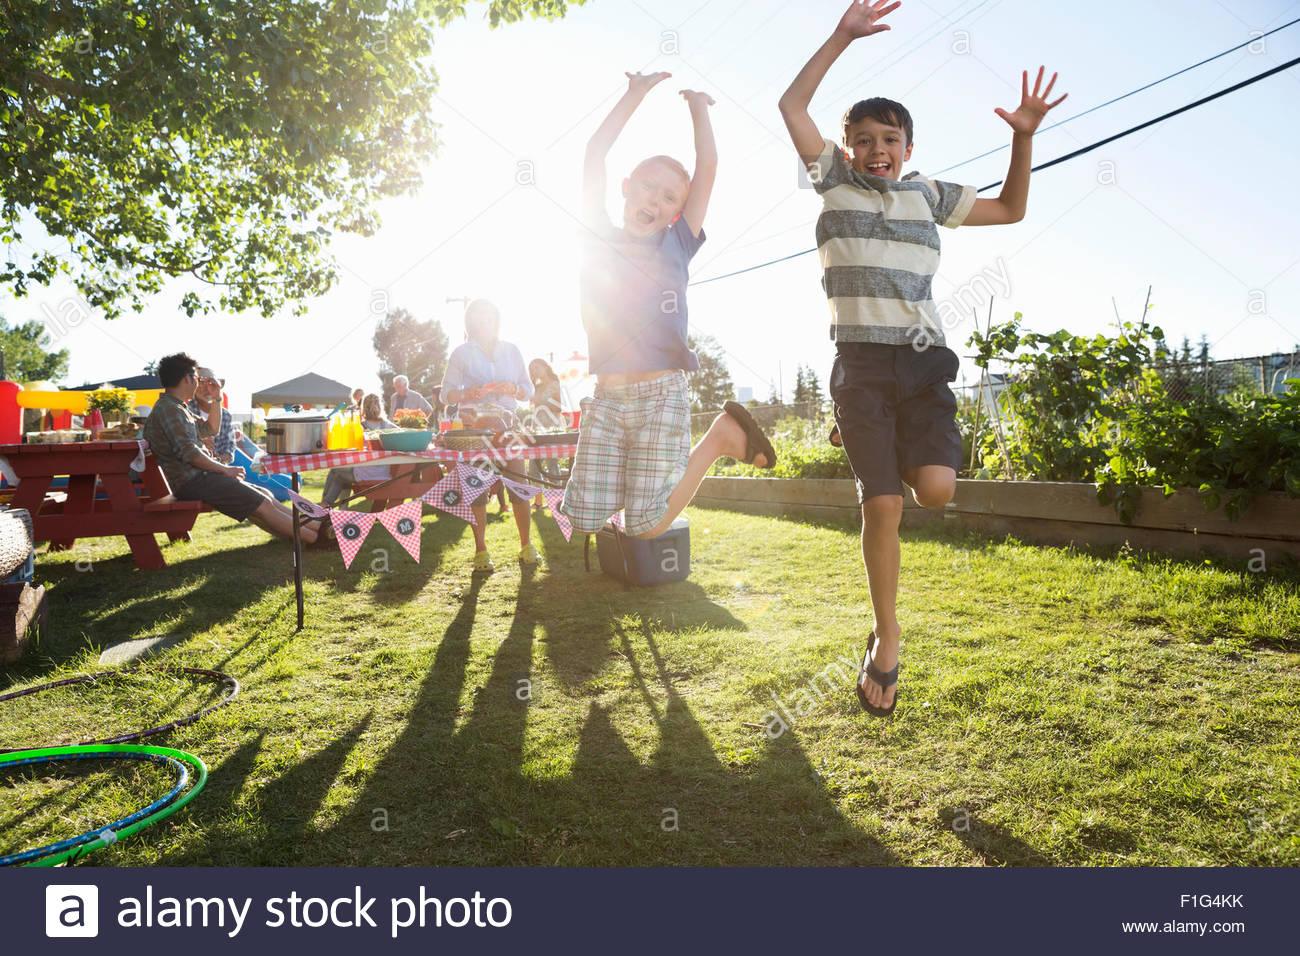 Porträt verspielte Jungs springen vor Freude sonnigen park Stockbild